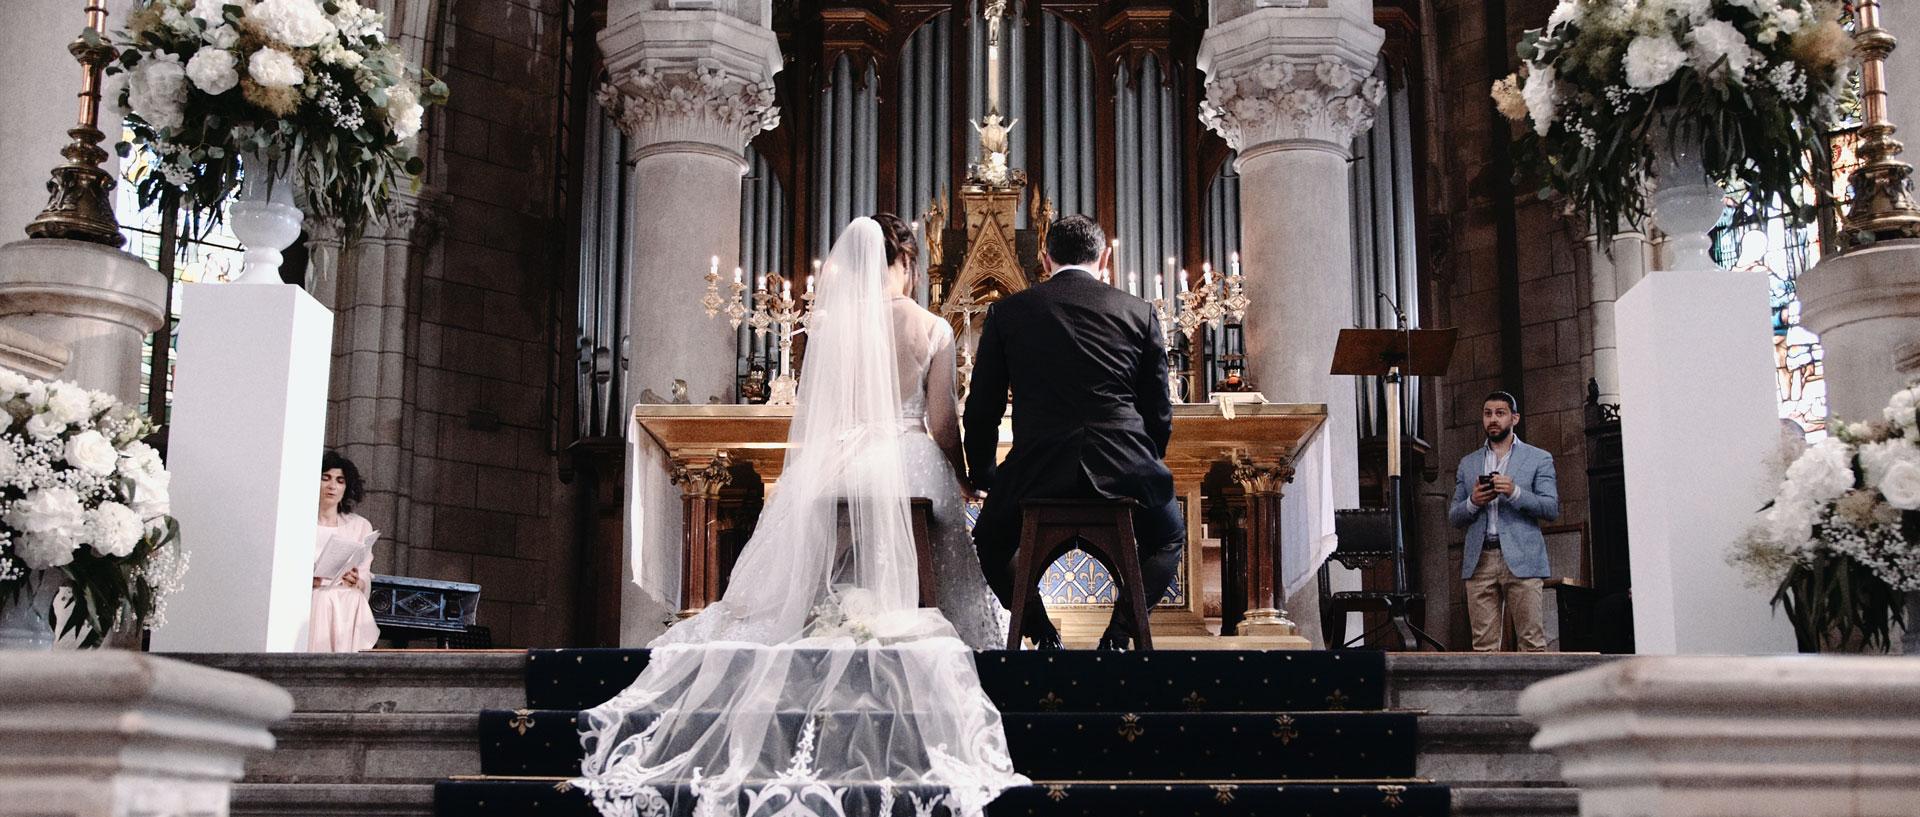 Natasha & Jad Wedding - Casino Biarritz (35).jpg